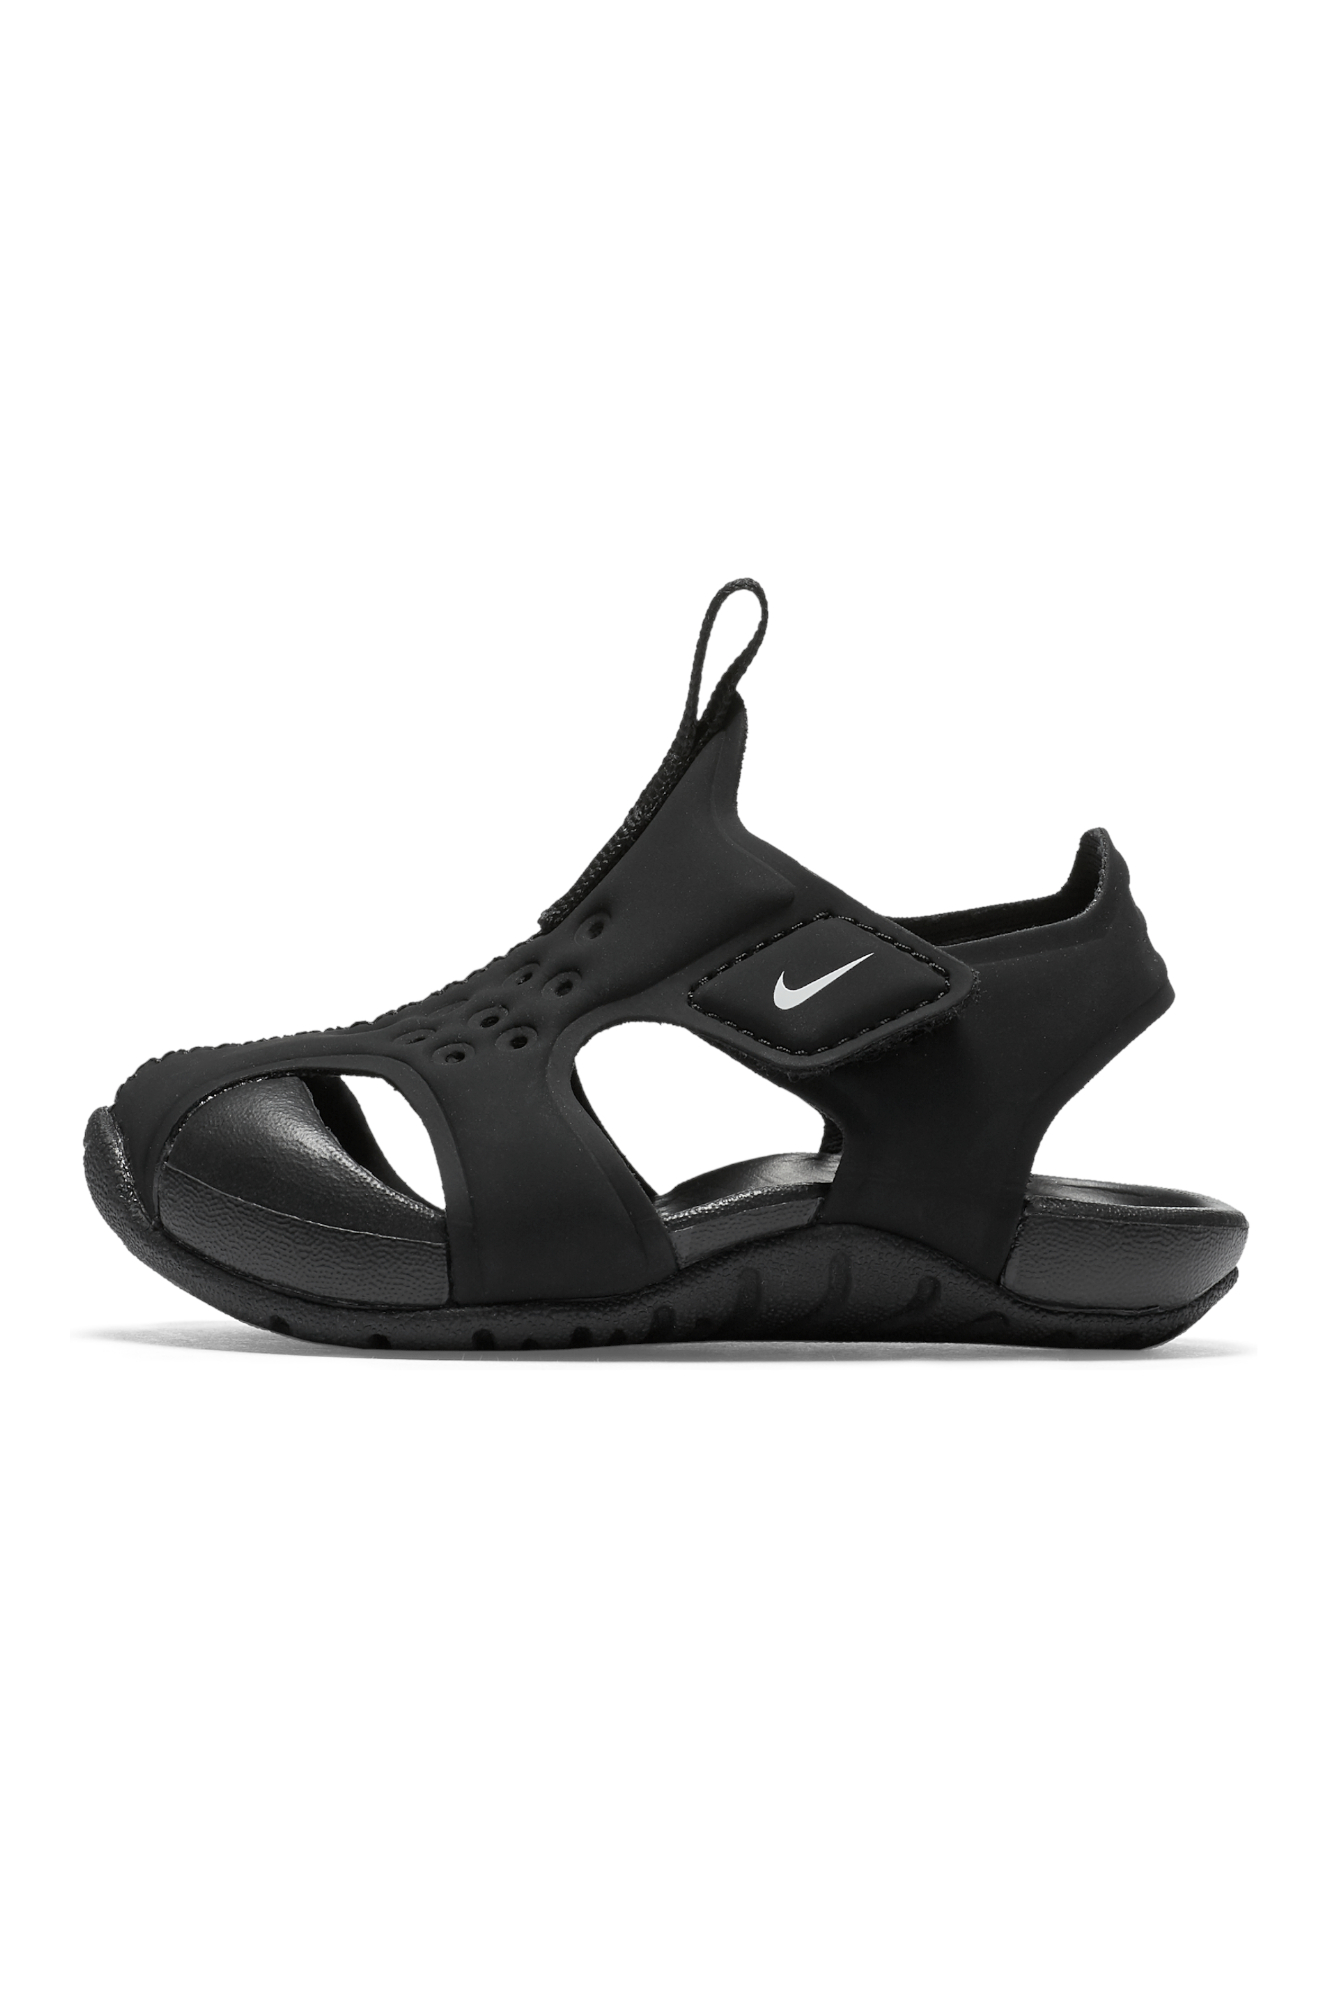 d1f7fa2cd9b Sandały Nike Sunray Protect 2 - 943827-001   Sandały   Buty ...